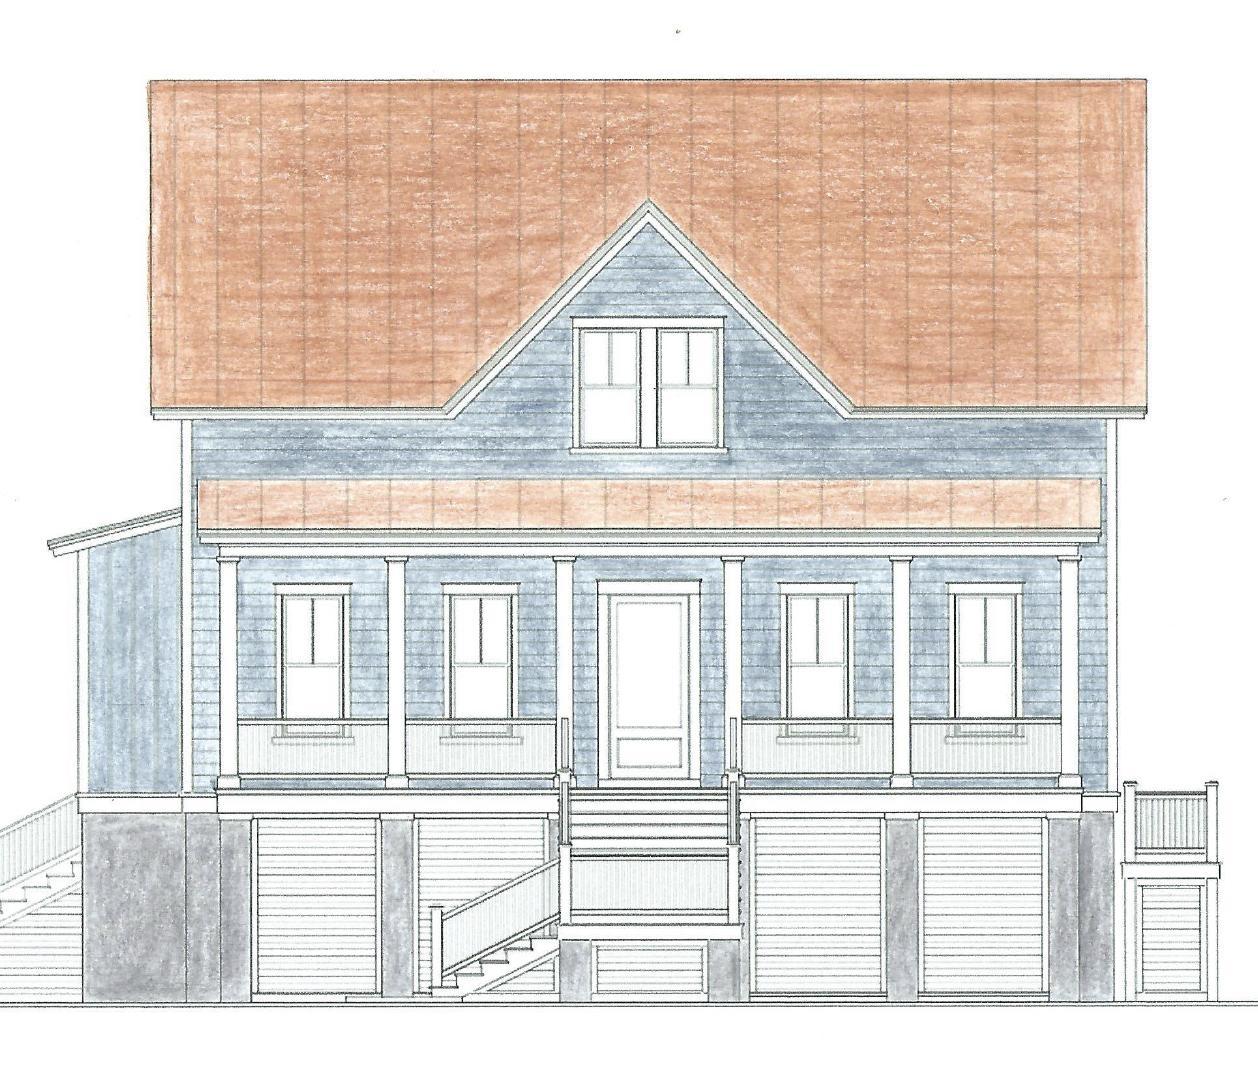 Seabrook Island Homes For Sale - 2501 Clear Marsh, Seabrook Island, SC - 0